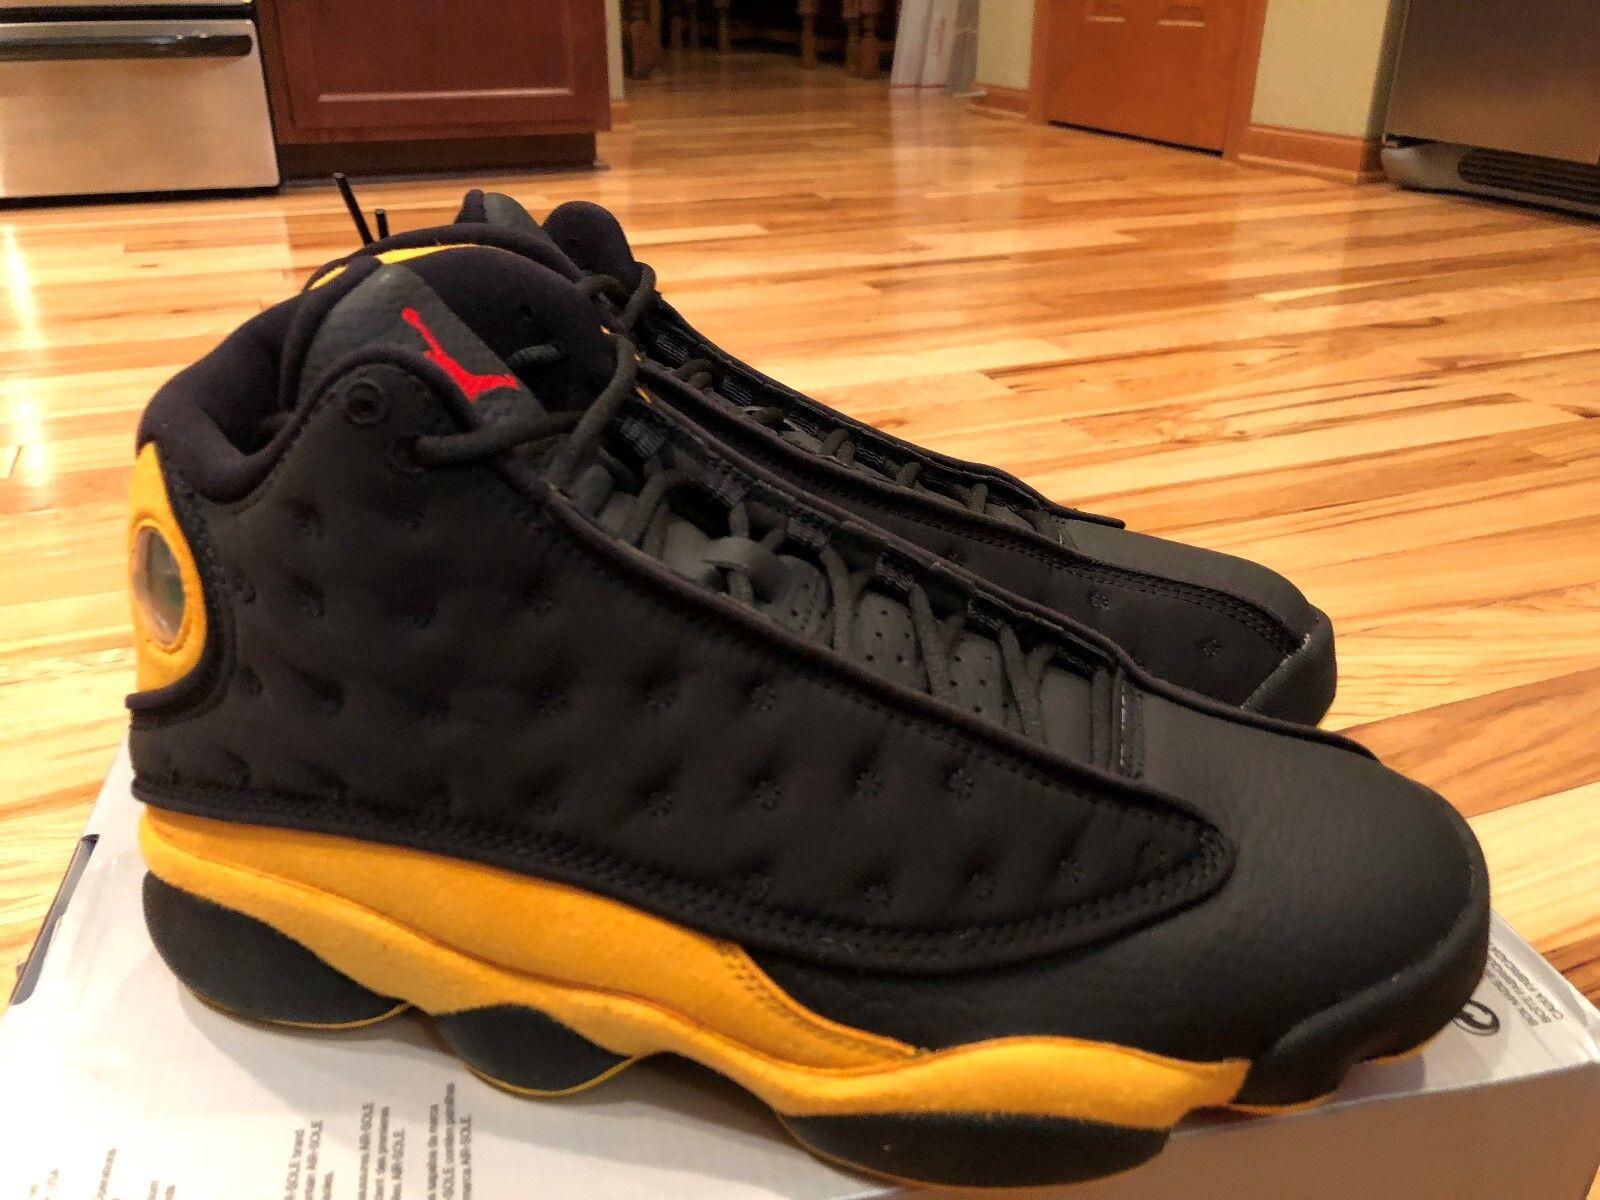 Nike Air Jordan 13 Retro Melo Class of 2002 Oak Hill 414571-035 Size 9